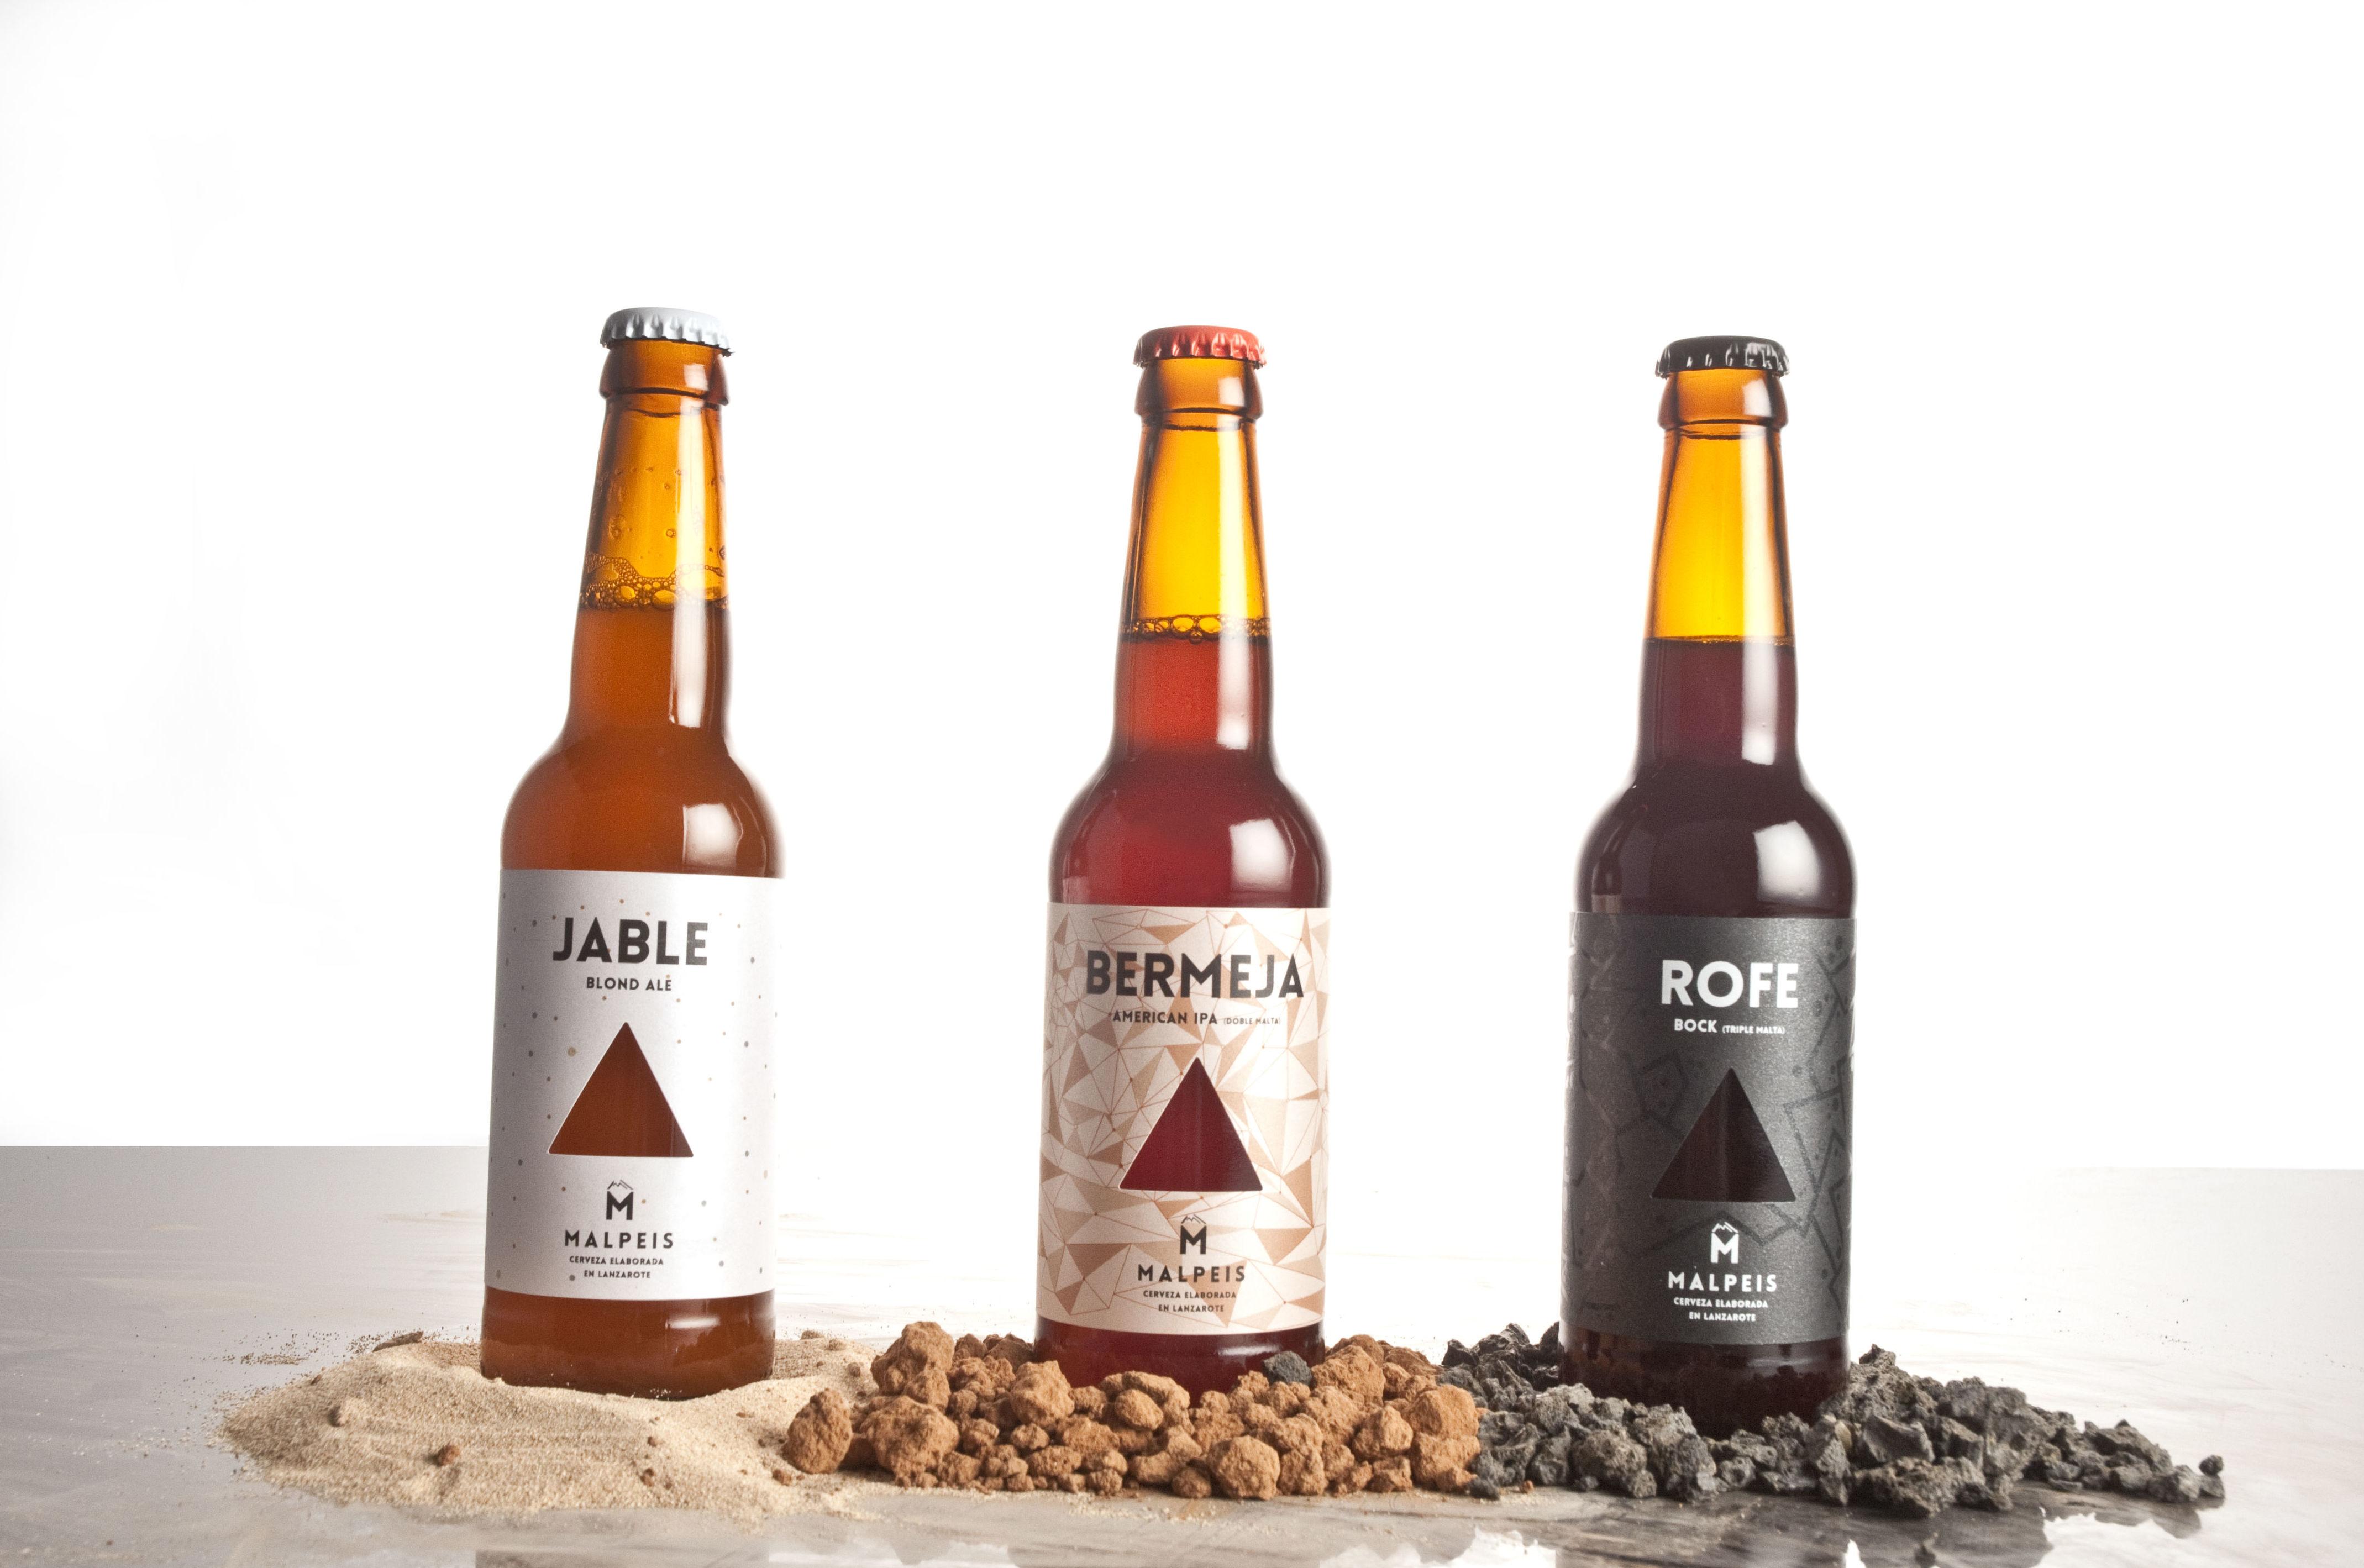 Cervezas artesanas Malpeis, Lanzarote